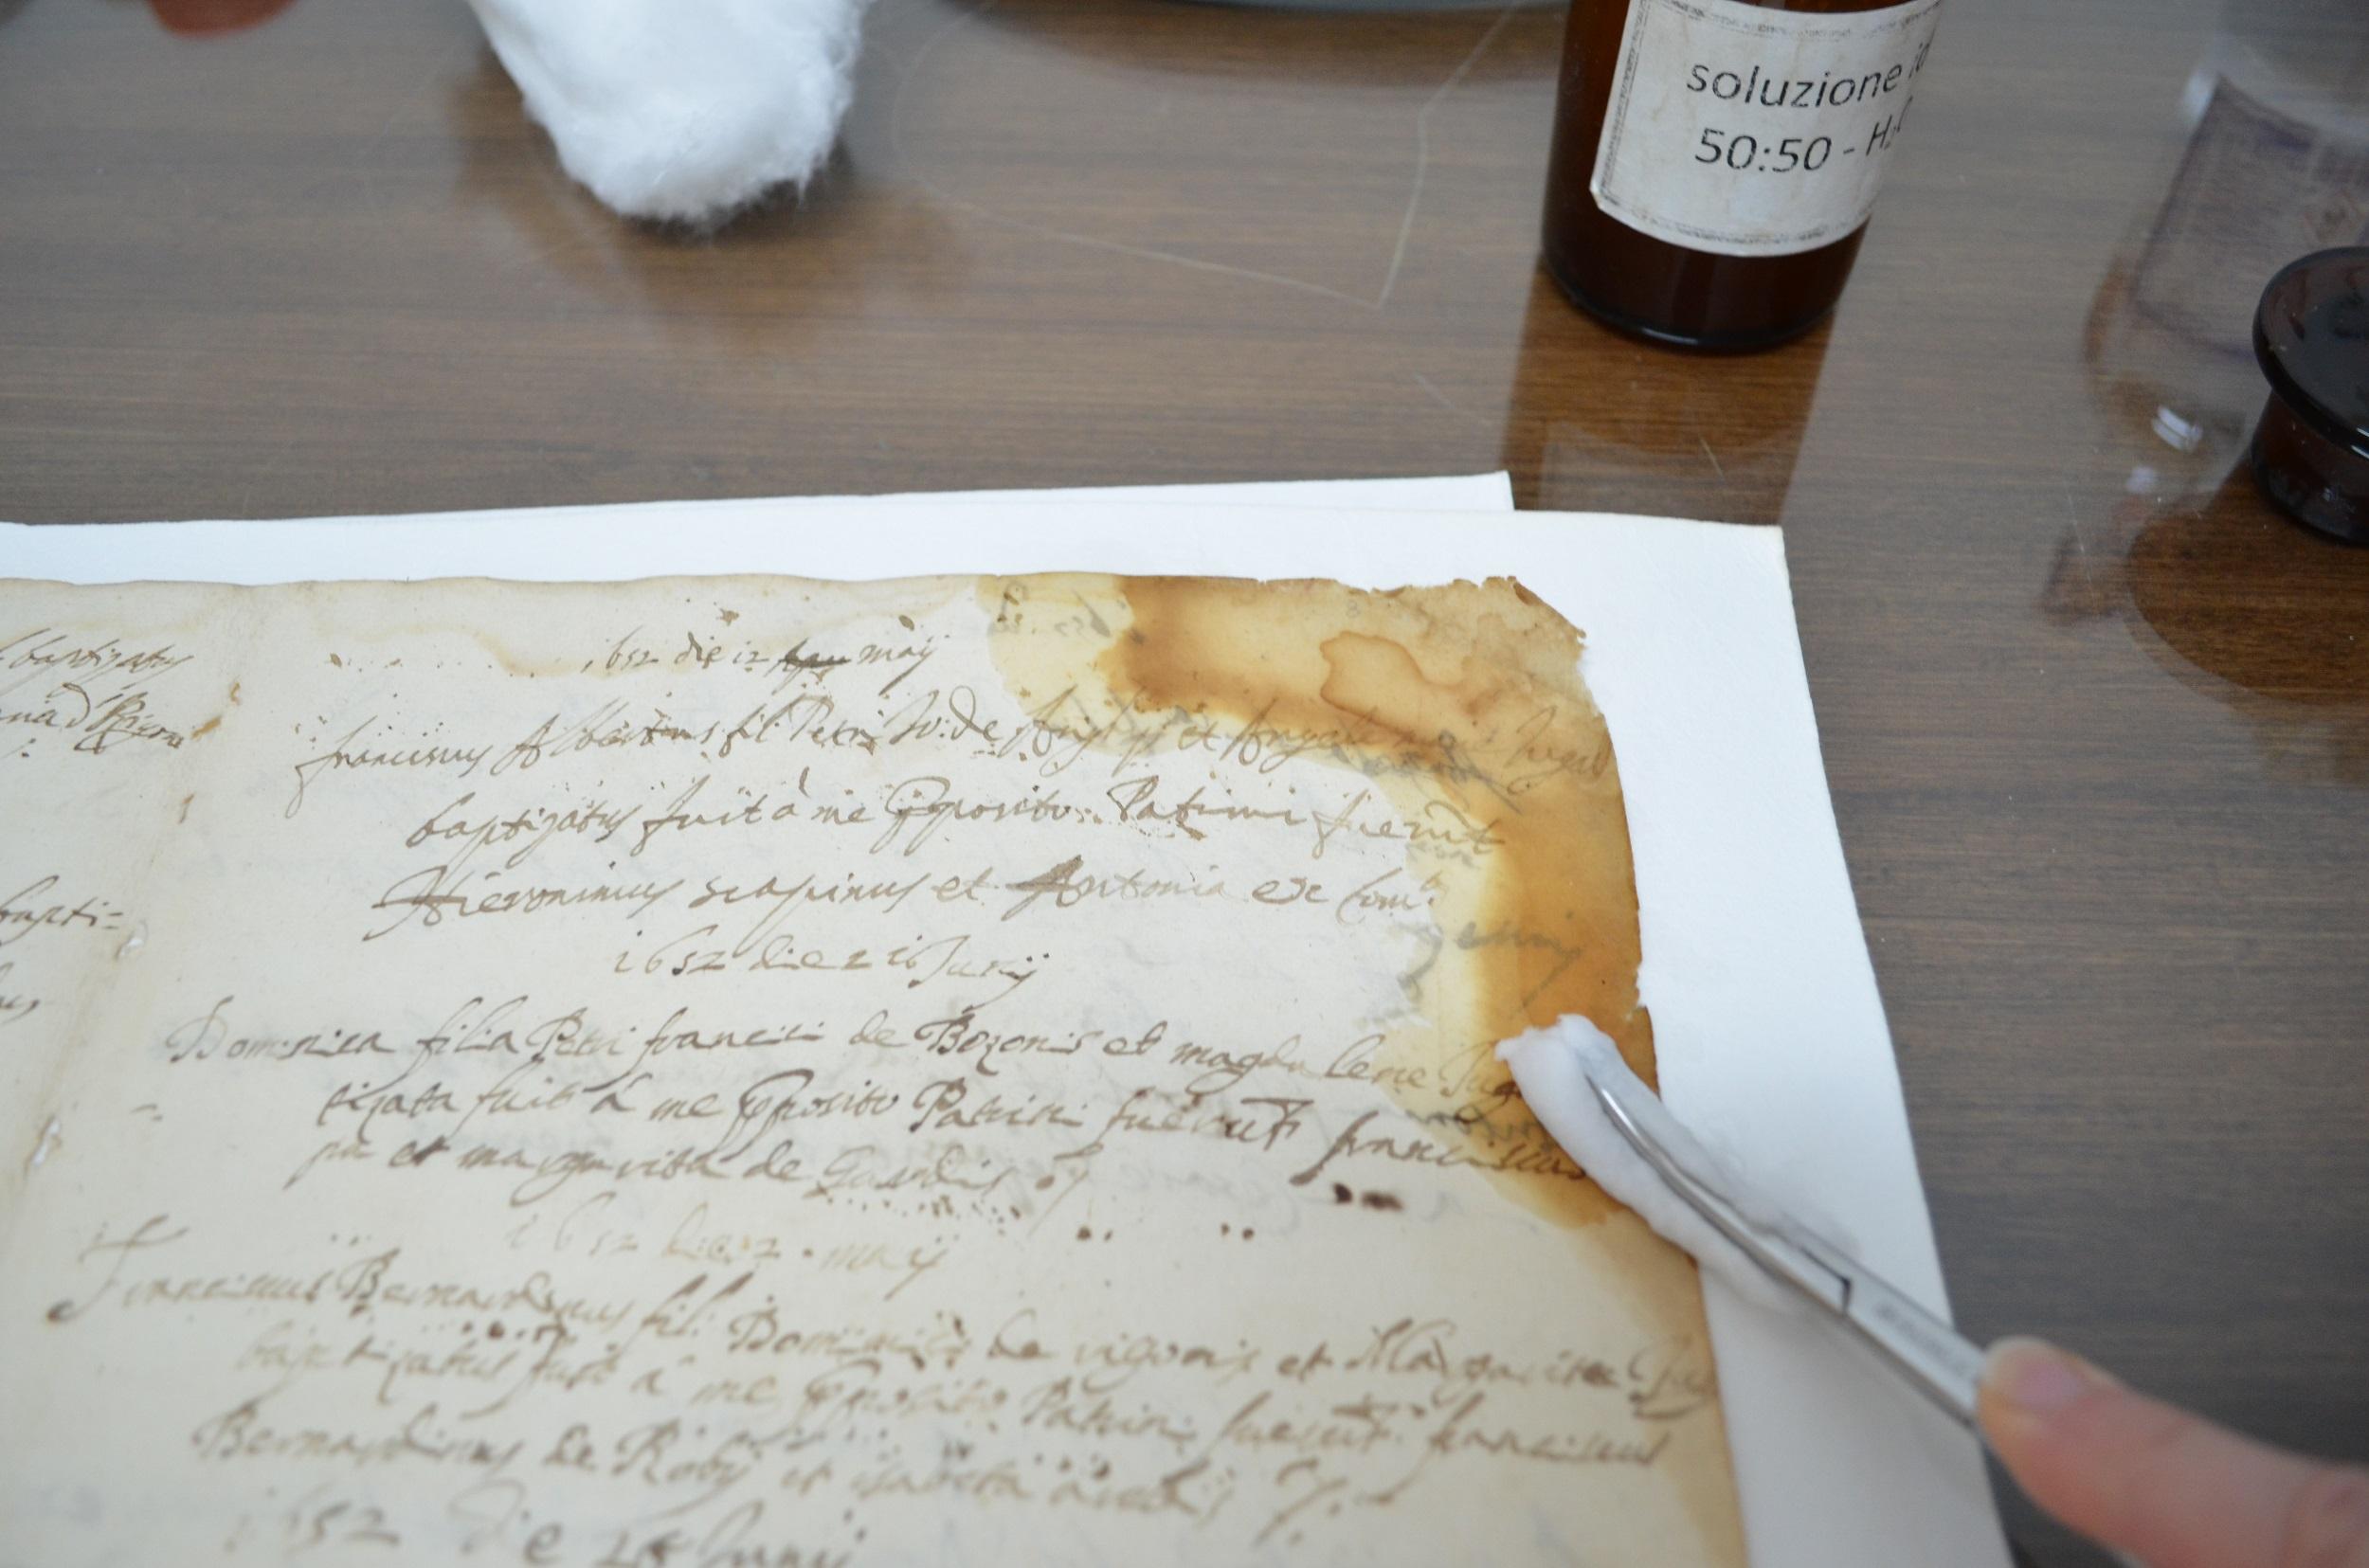 Liber Baptizatorum 1648 - 1703 Intervent